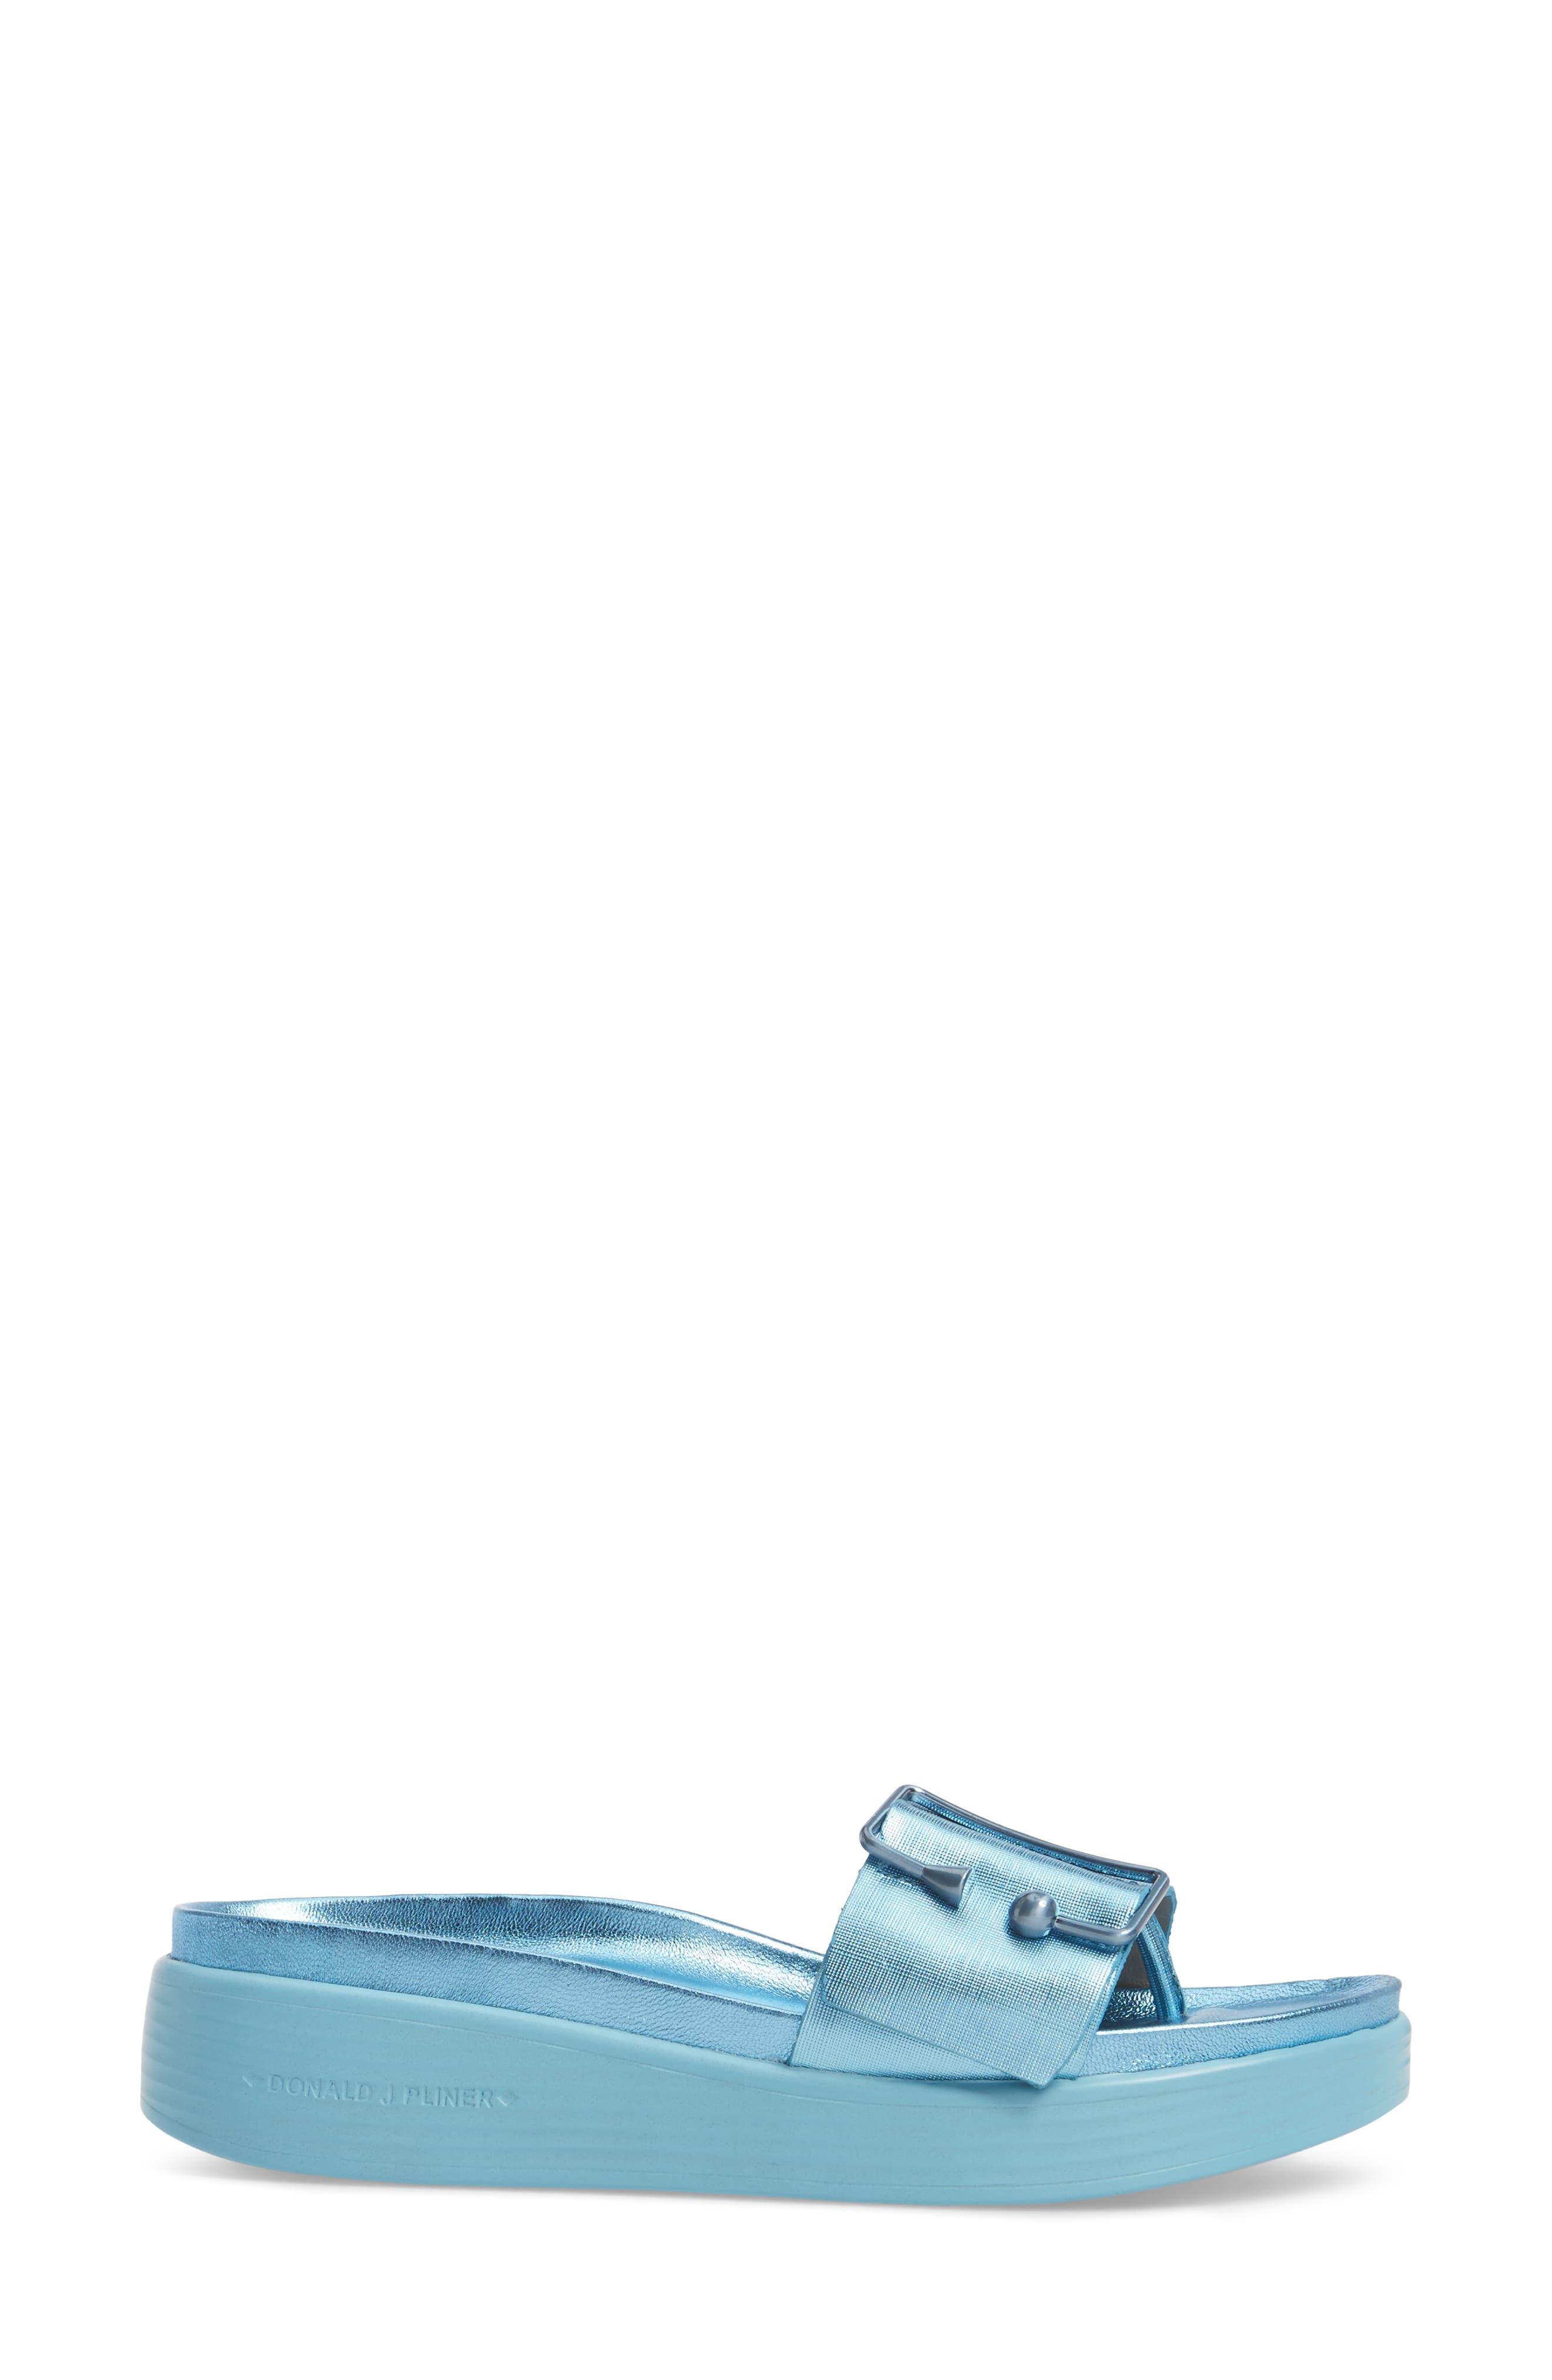 Alternate Image 3  - Donald Pliner Fara Platform Slide Sandal (Women)